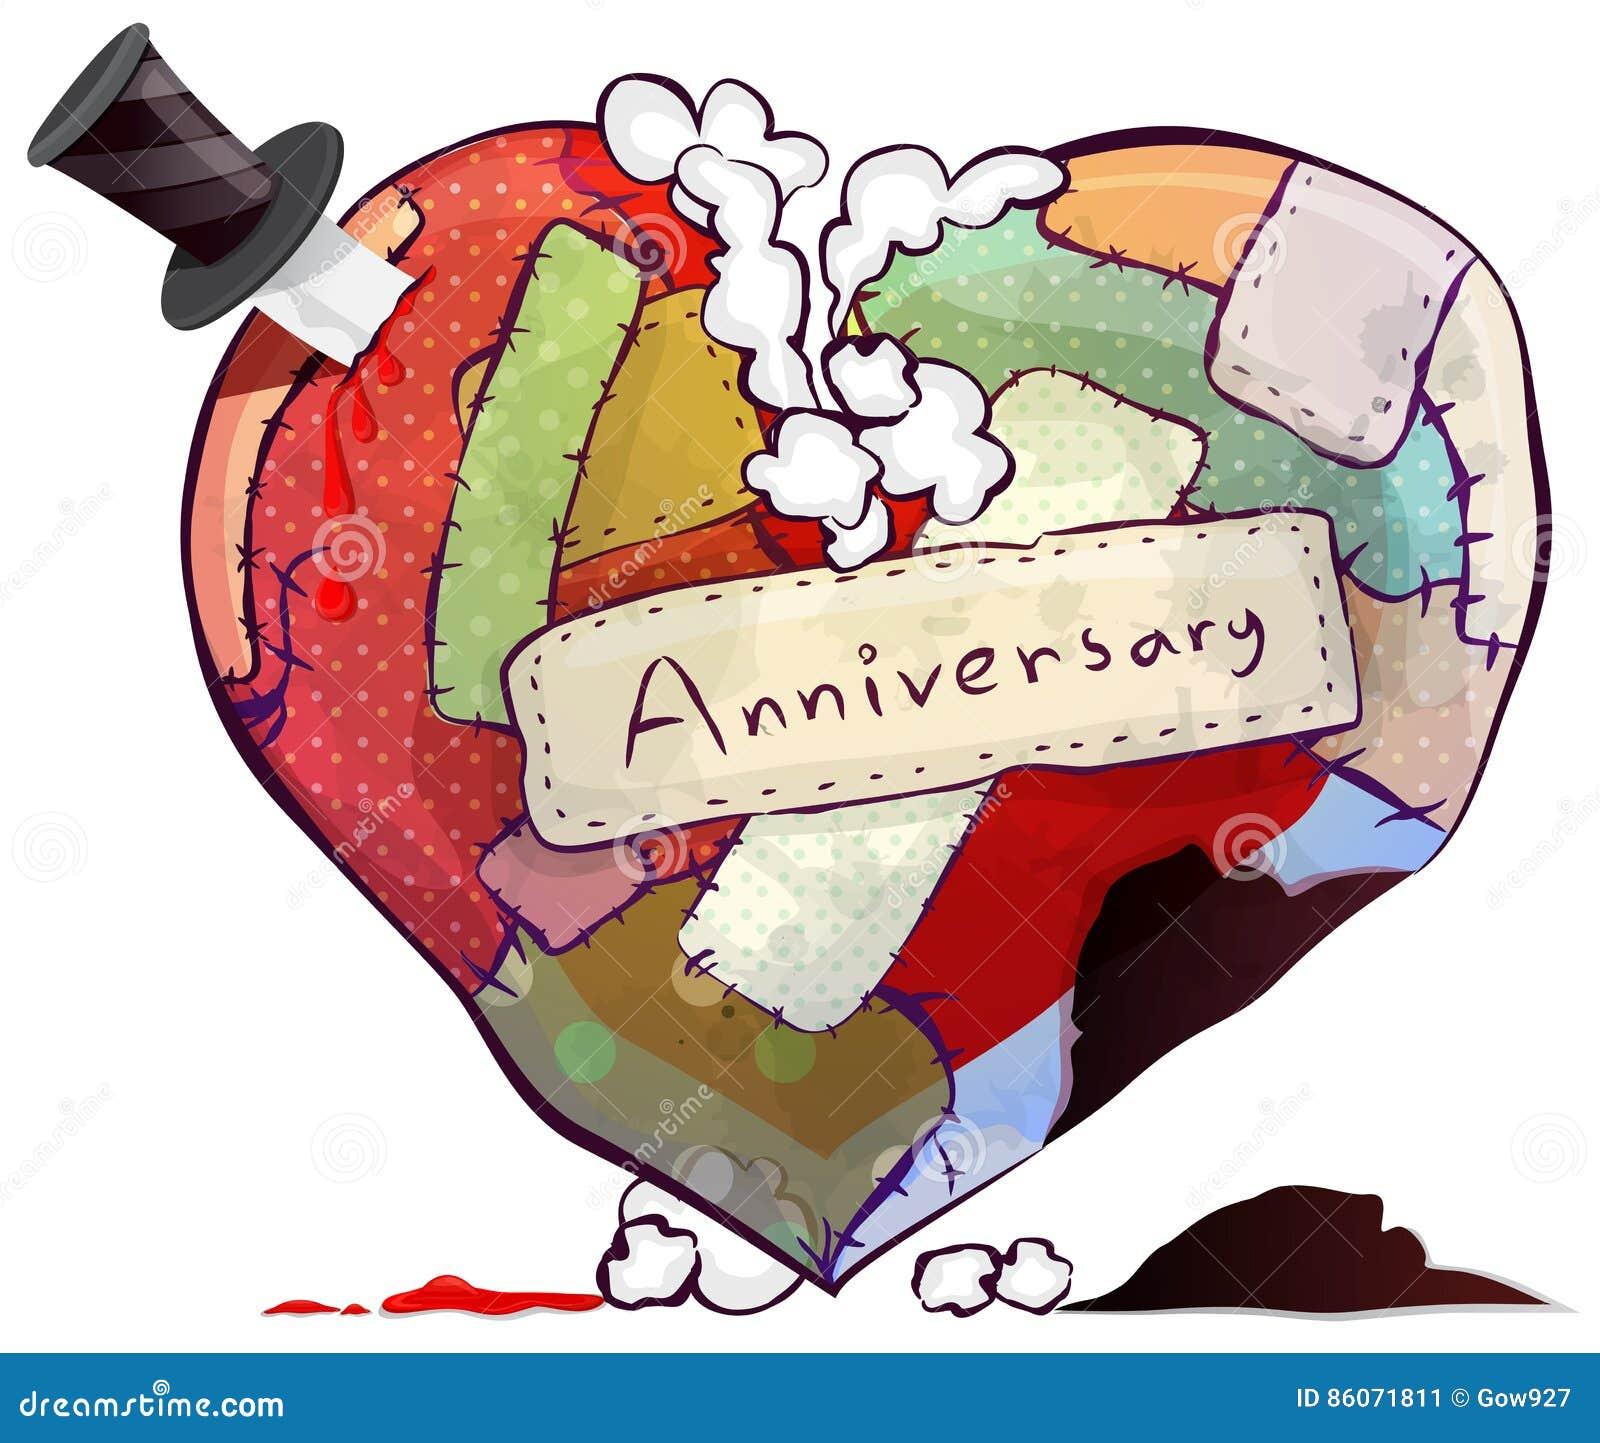 Doll or cushion pillow heart symbol represent everlasting love doll or cushion pillow heart symbol represent everlasting love biocorpaavc